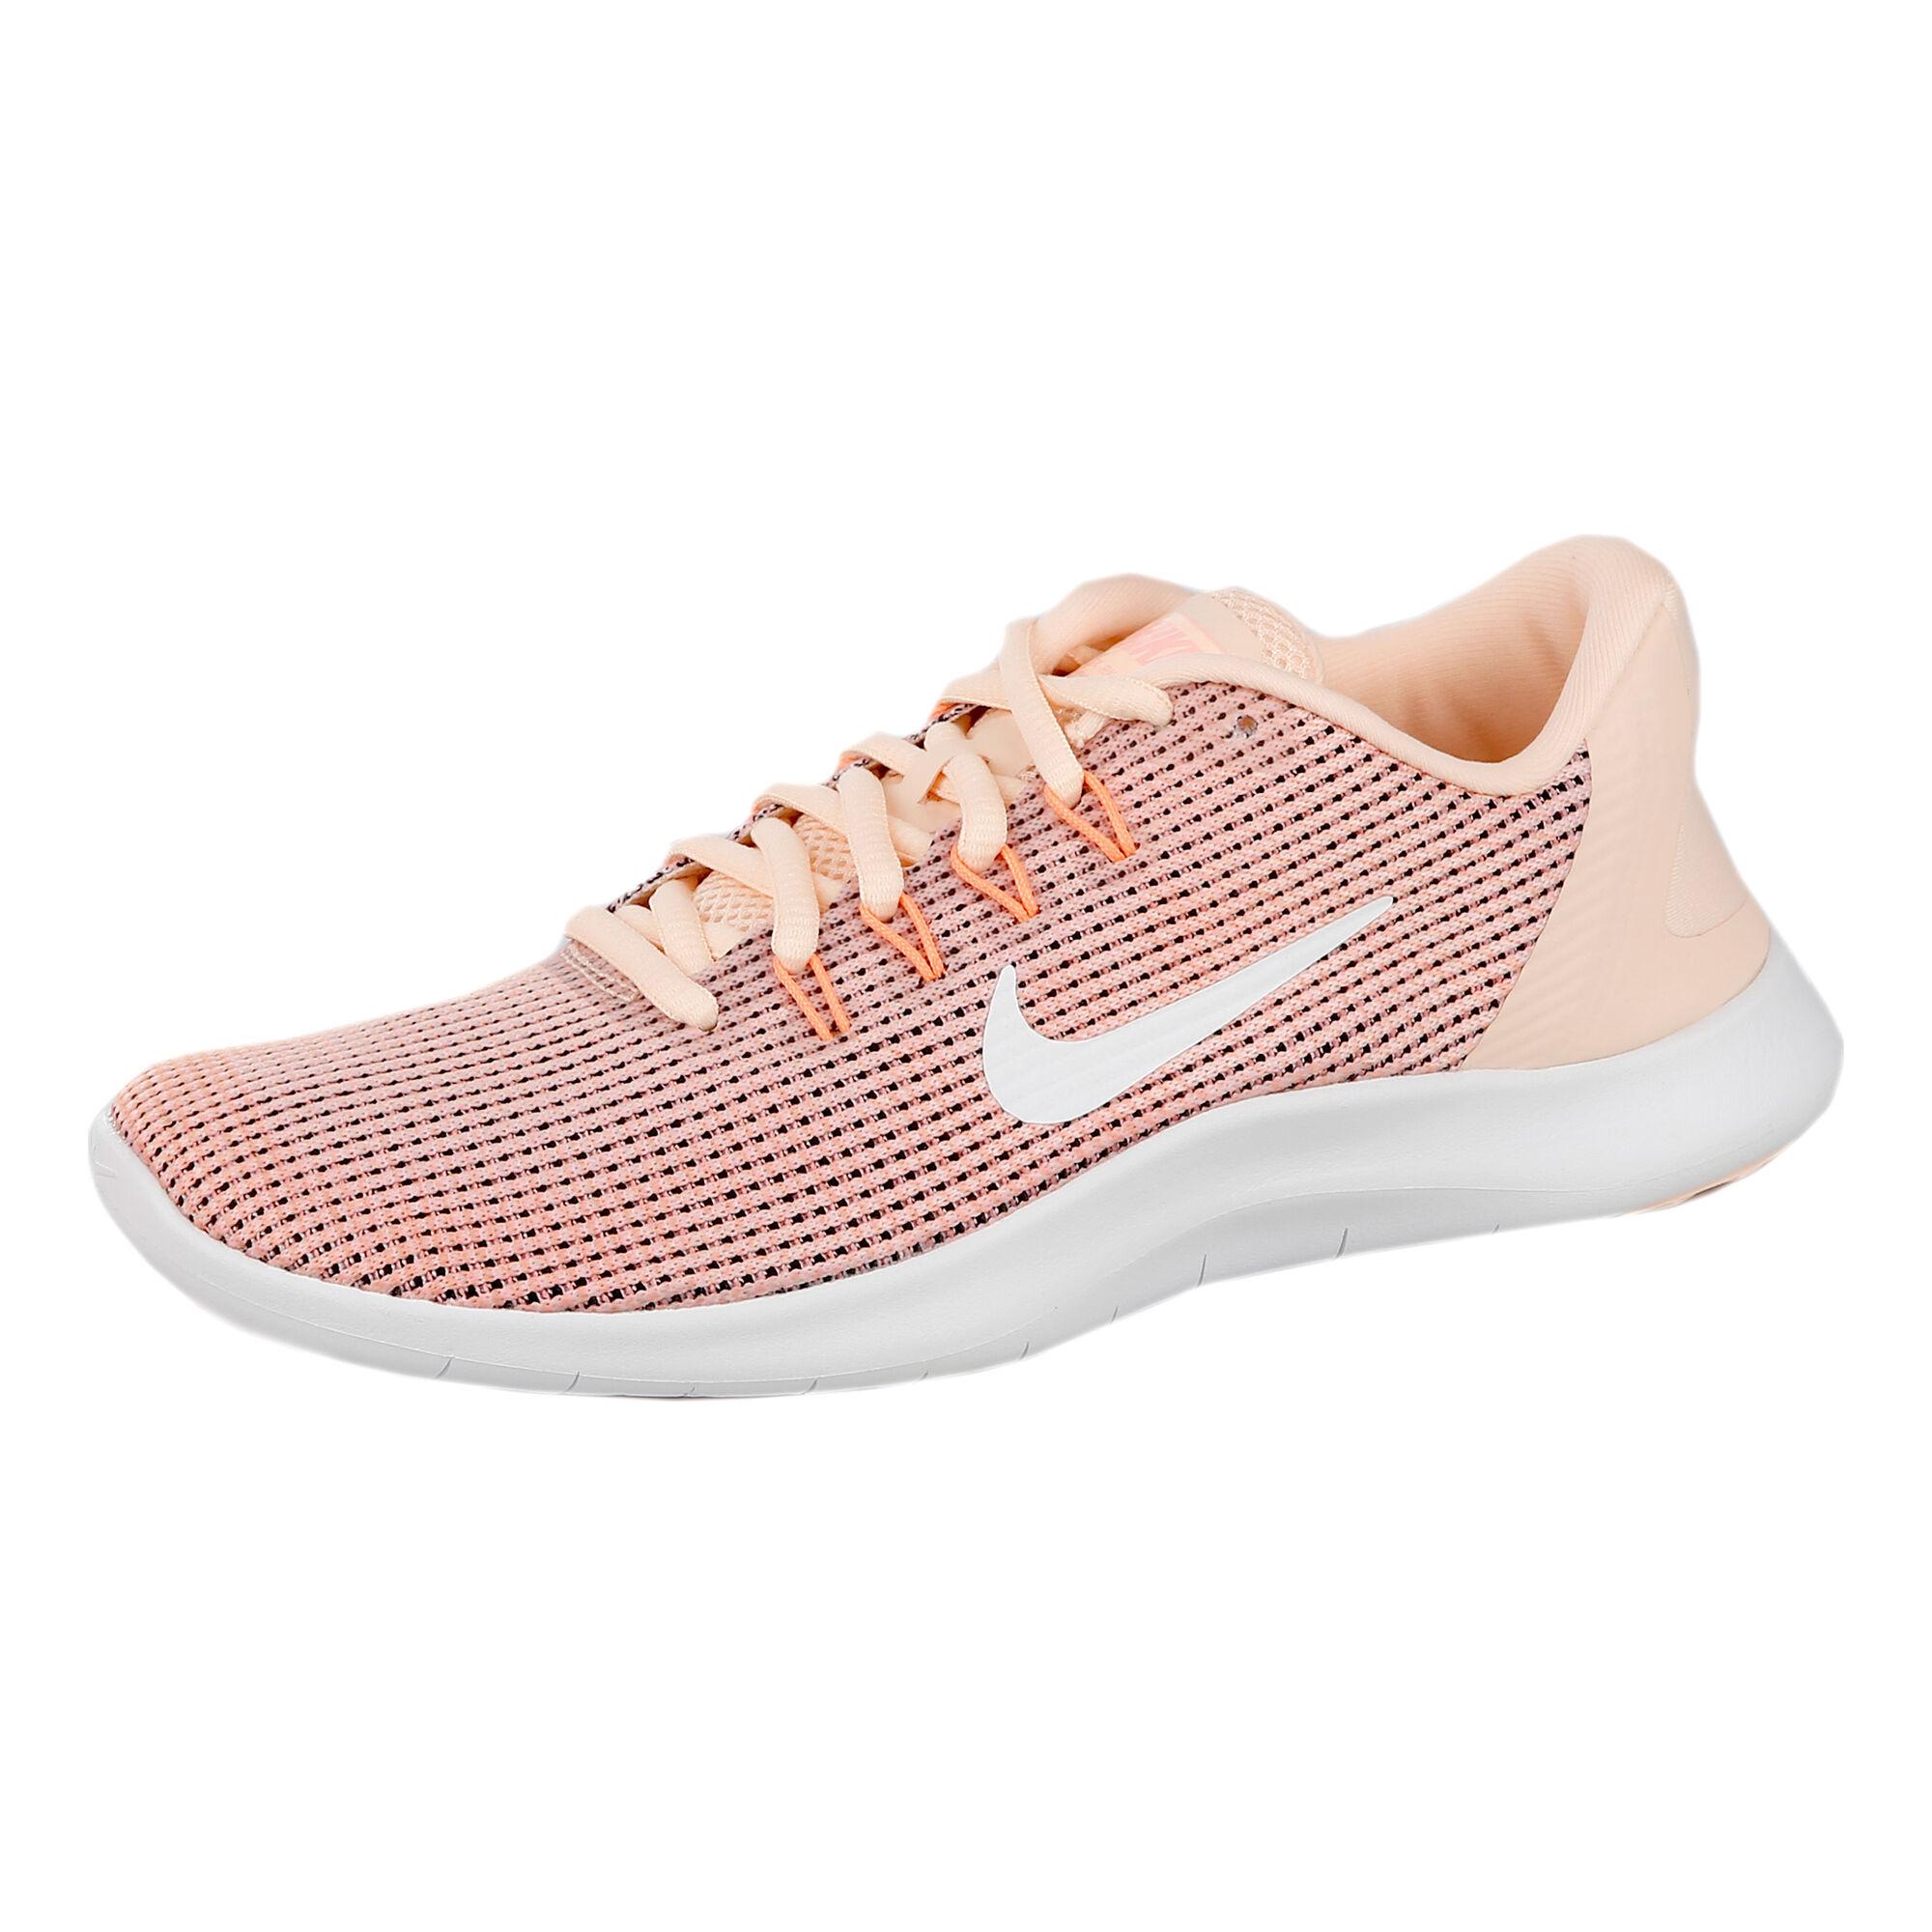 1f0bebf728892 Nike  Nike  Nike  Nike  Nike  Nike  Nike  Nike. Flex Run 2018 Women ...